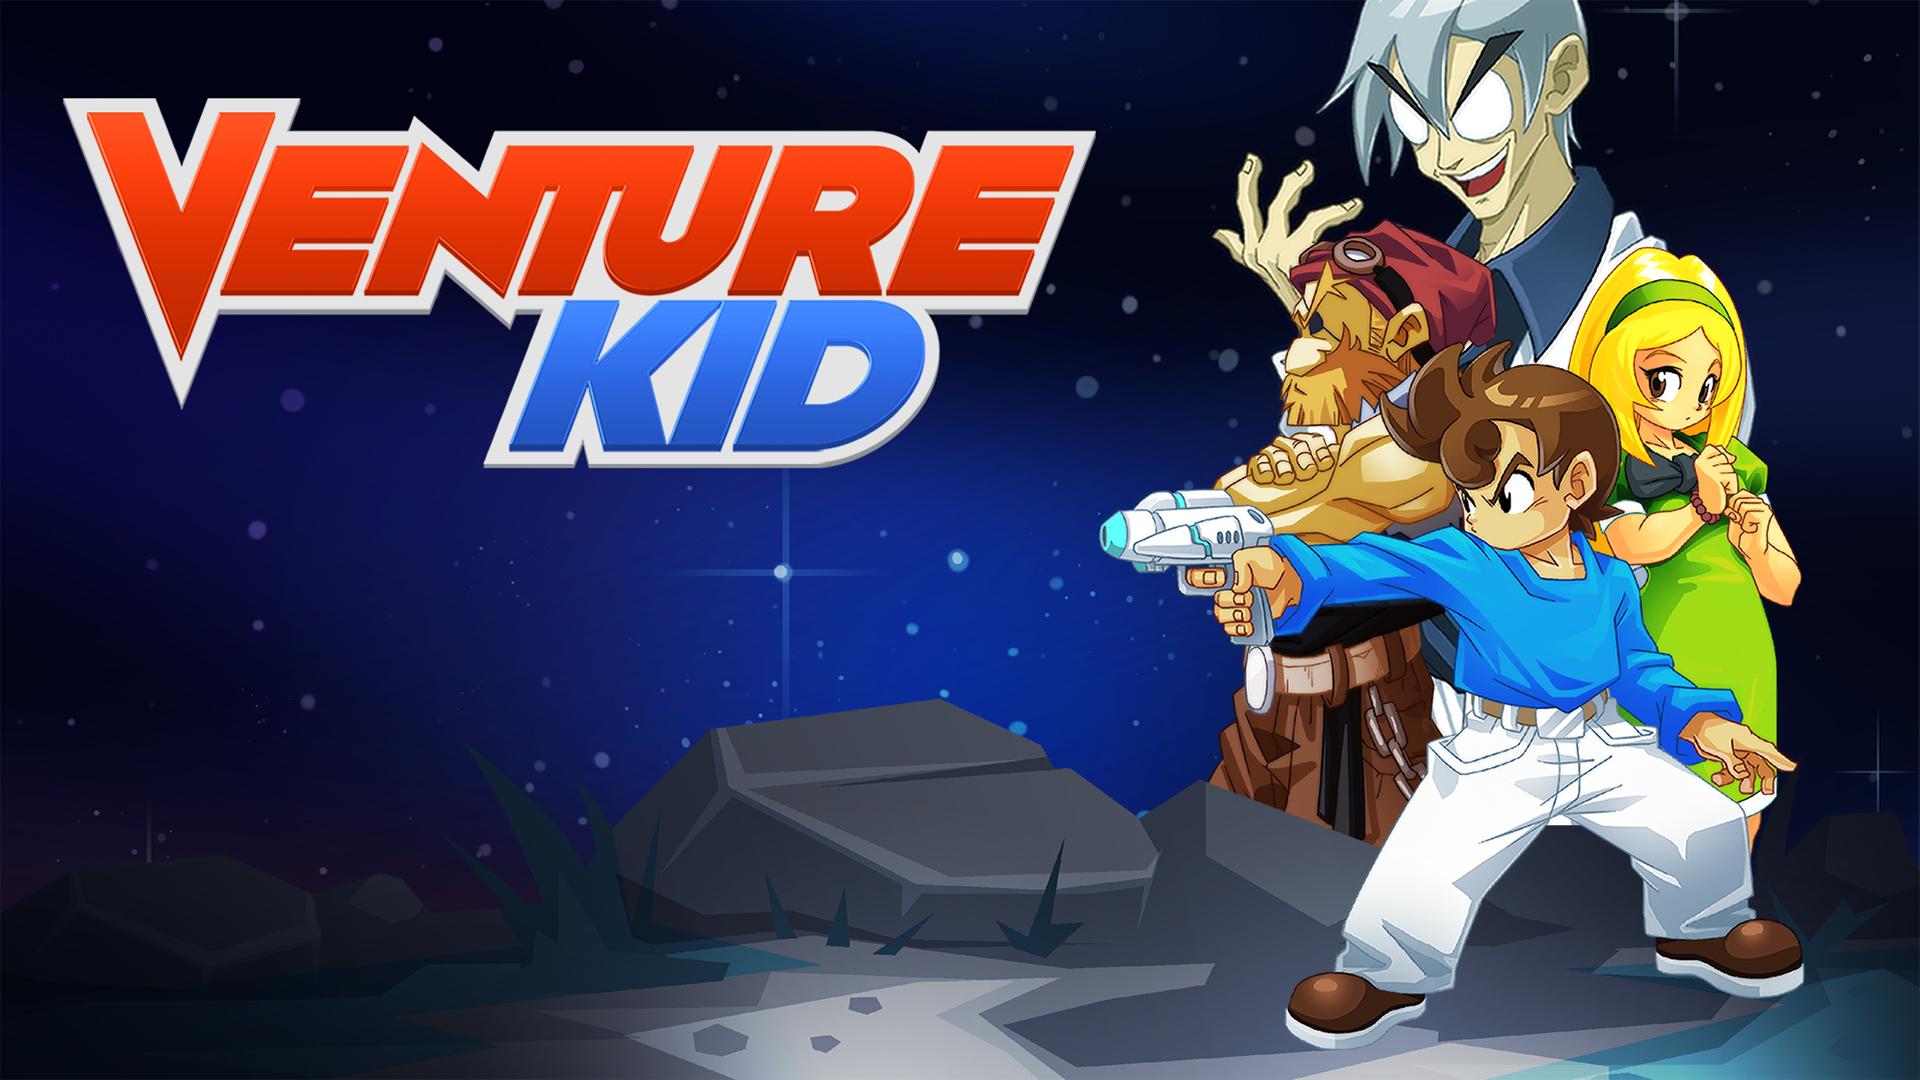 Nintendo eShop: Nintendo Switch - Venture Kid